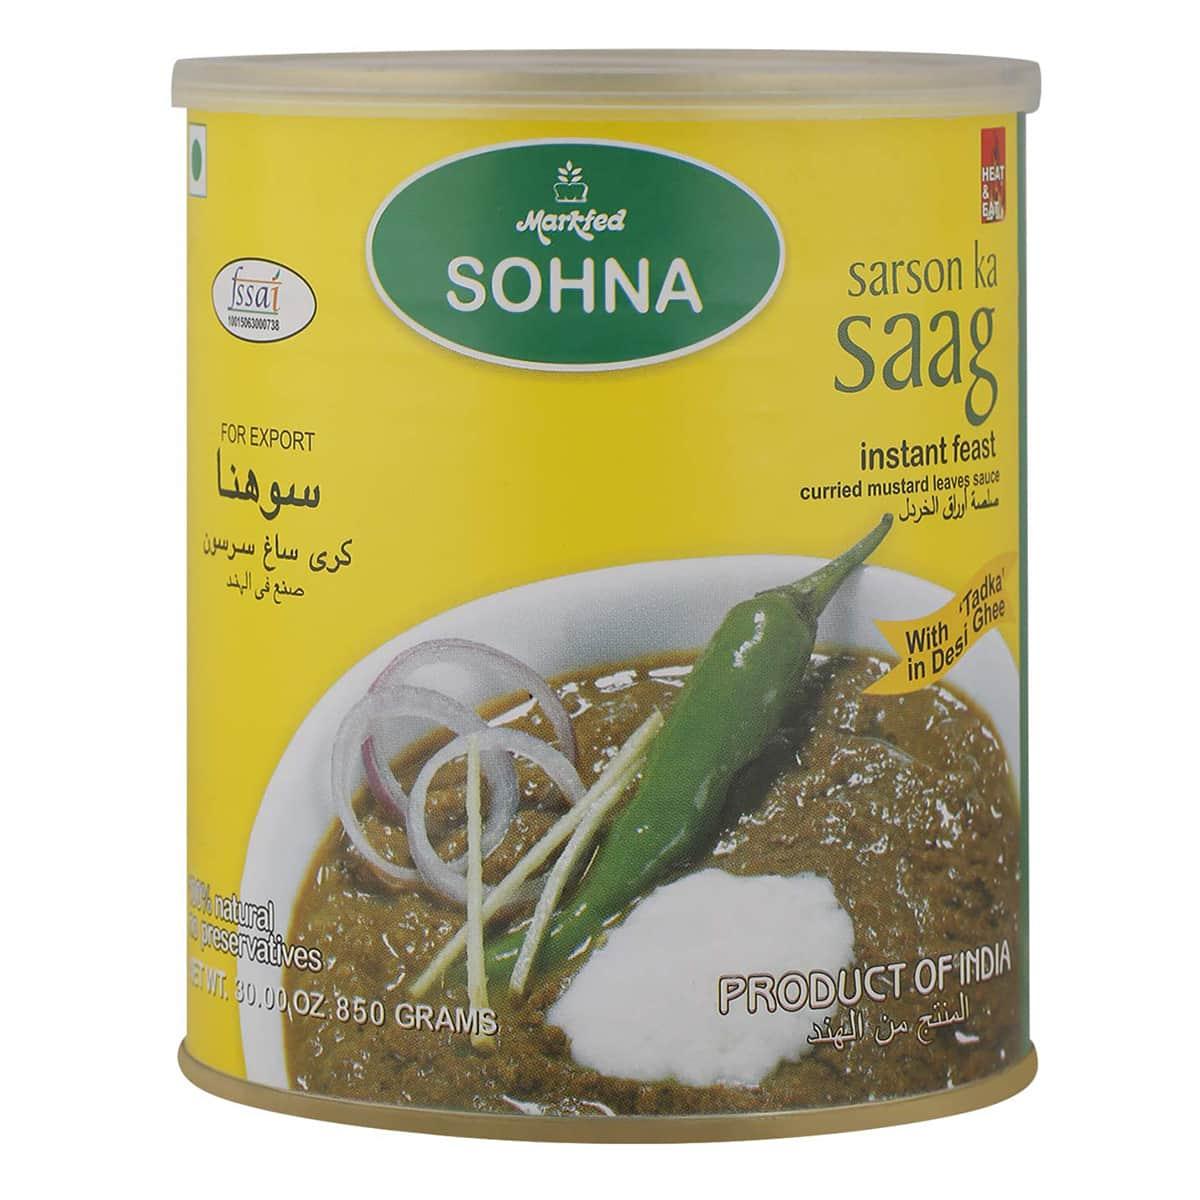 Buy Markfed Sohna Sarson Ka Saag (Curried Mustard Leaves) - 850 gm